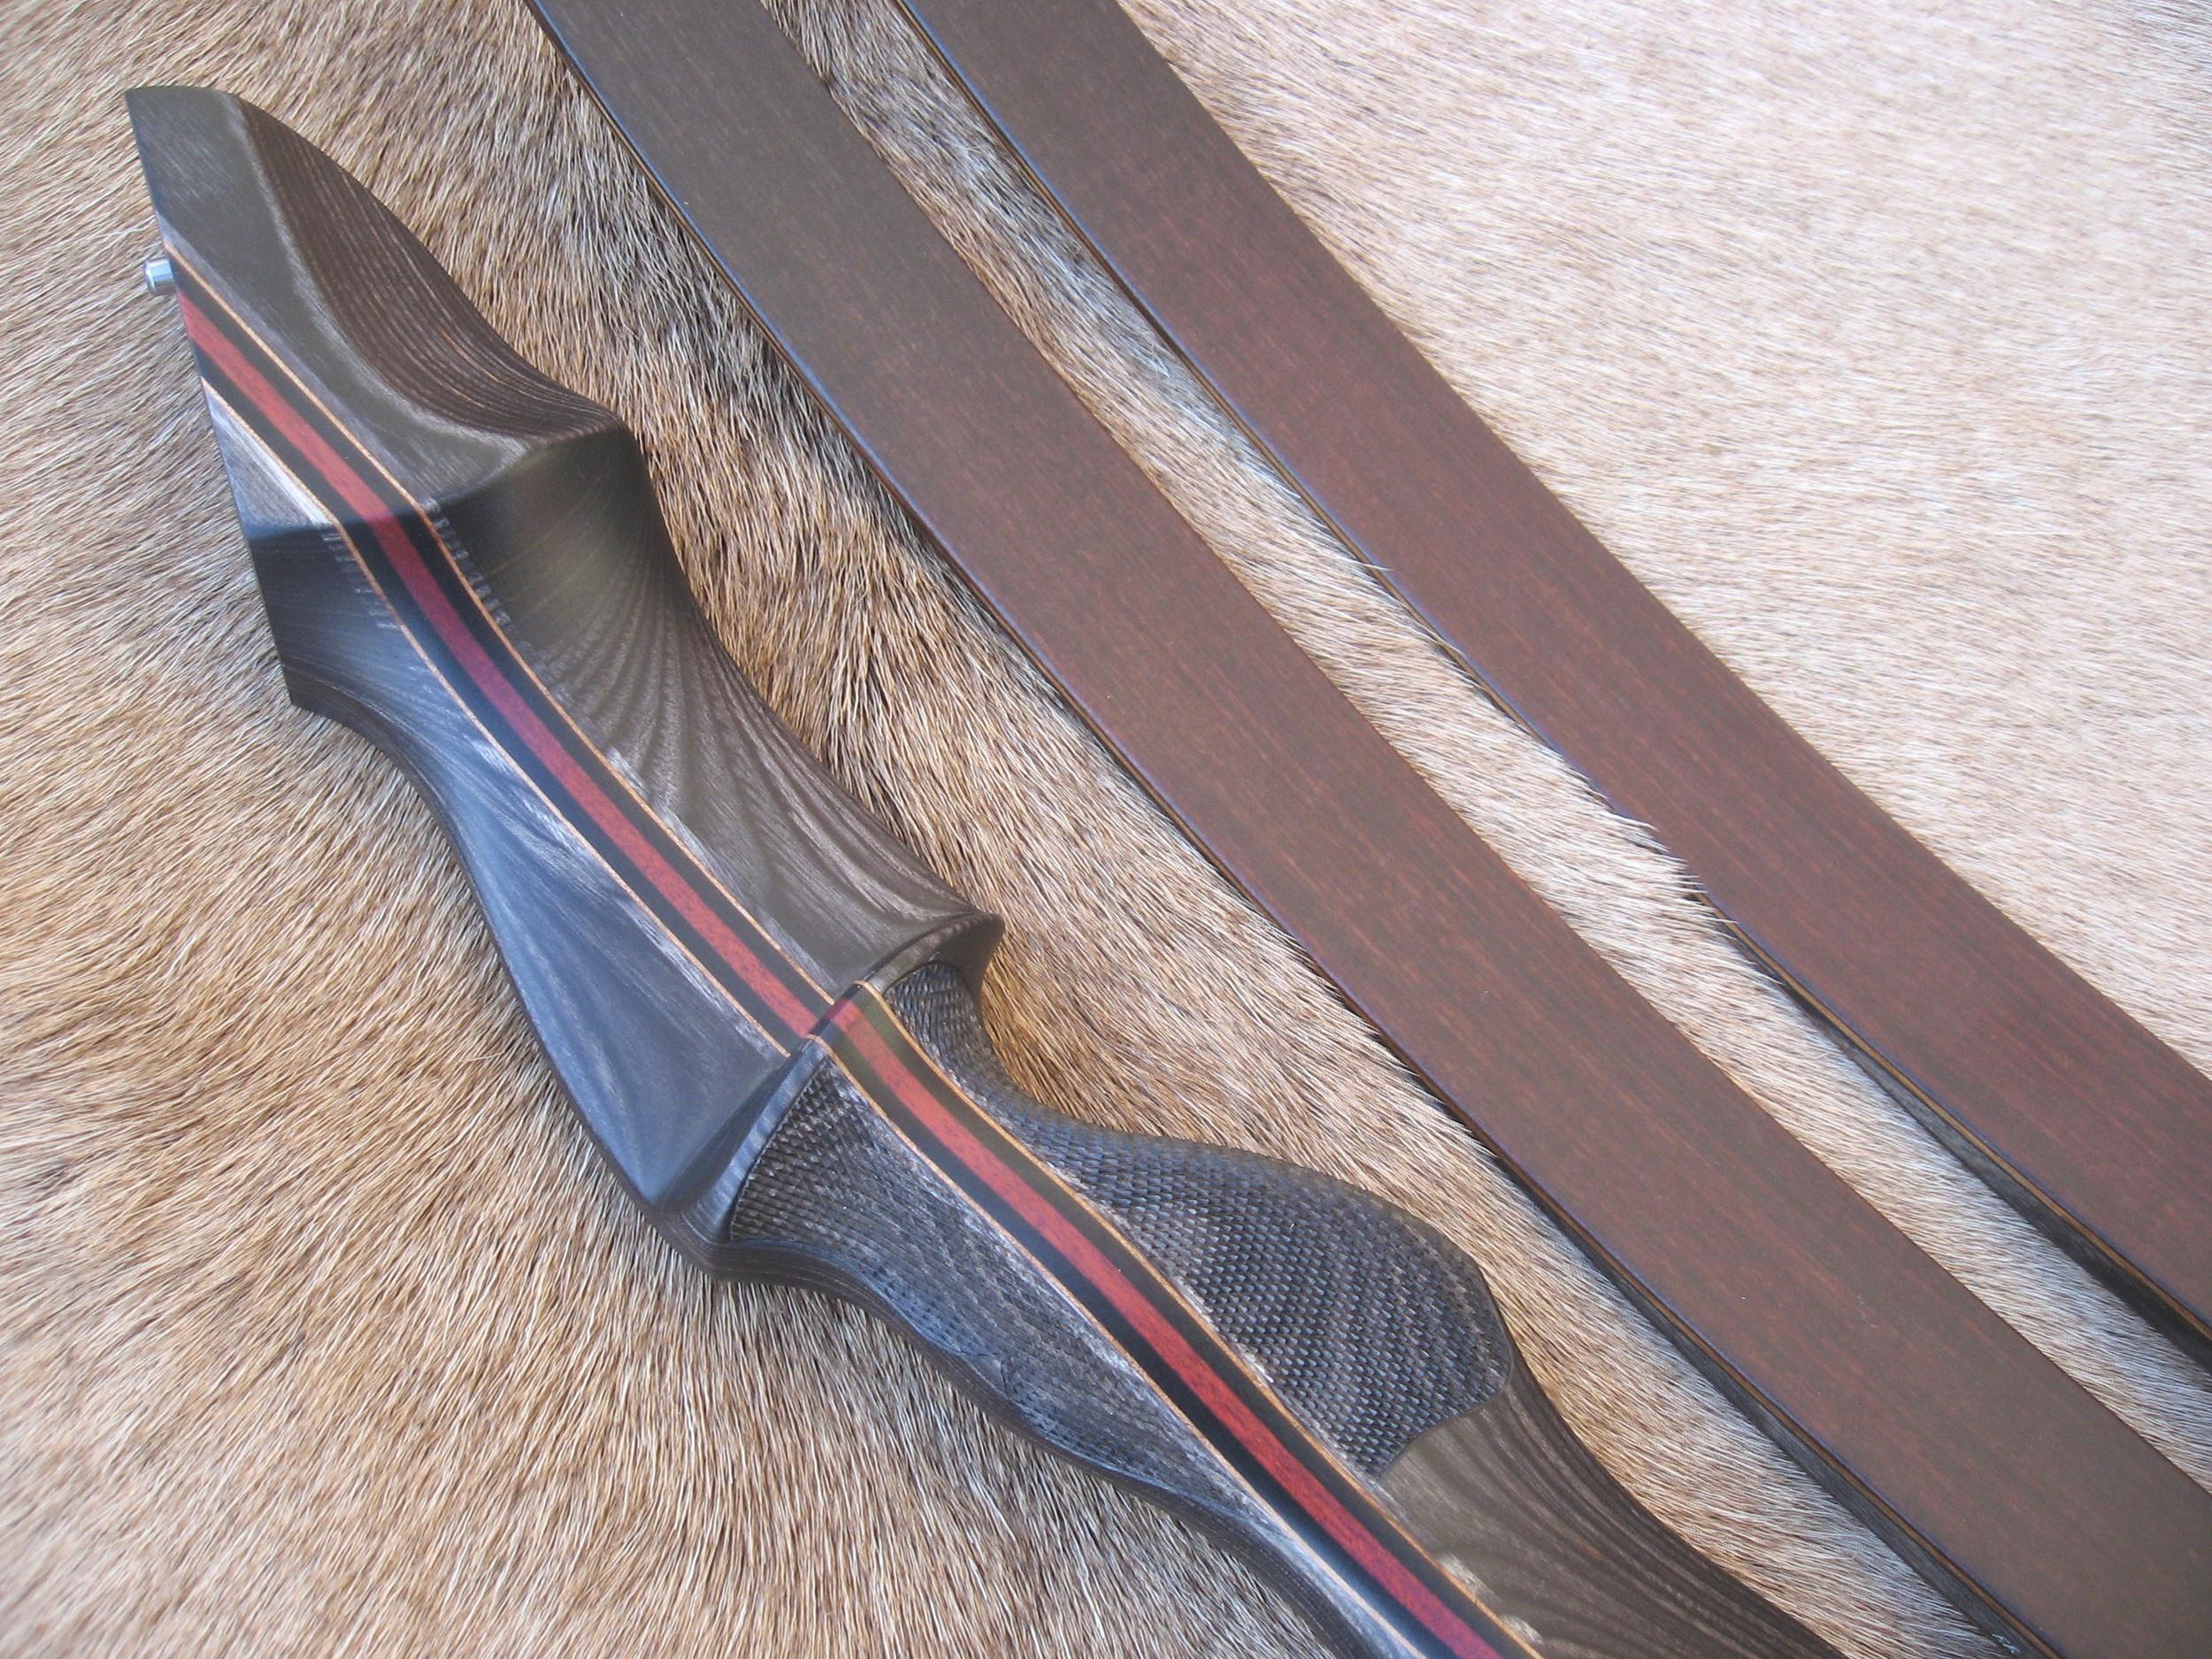 Charcoal Riser- Standard Rswd actionwood limbs